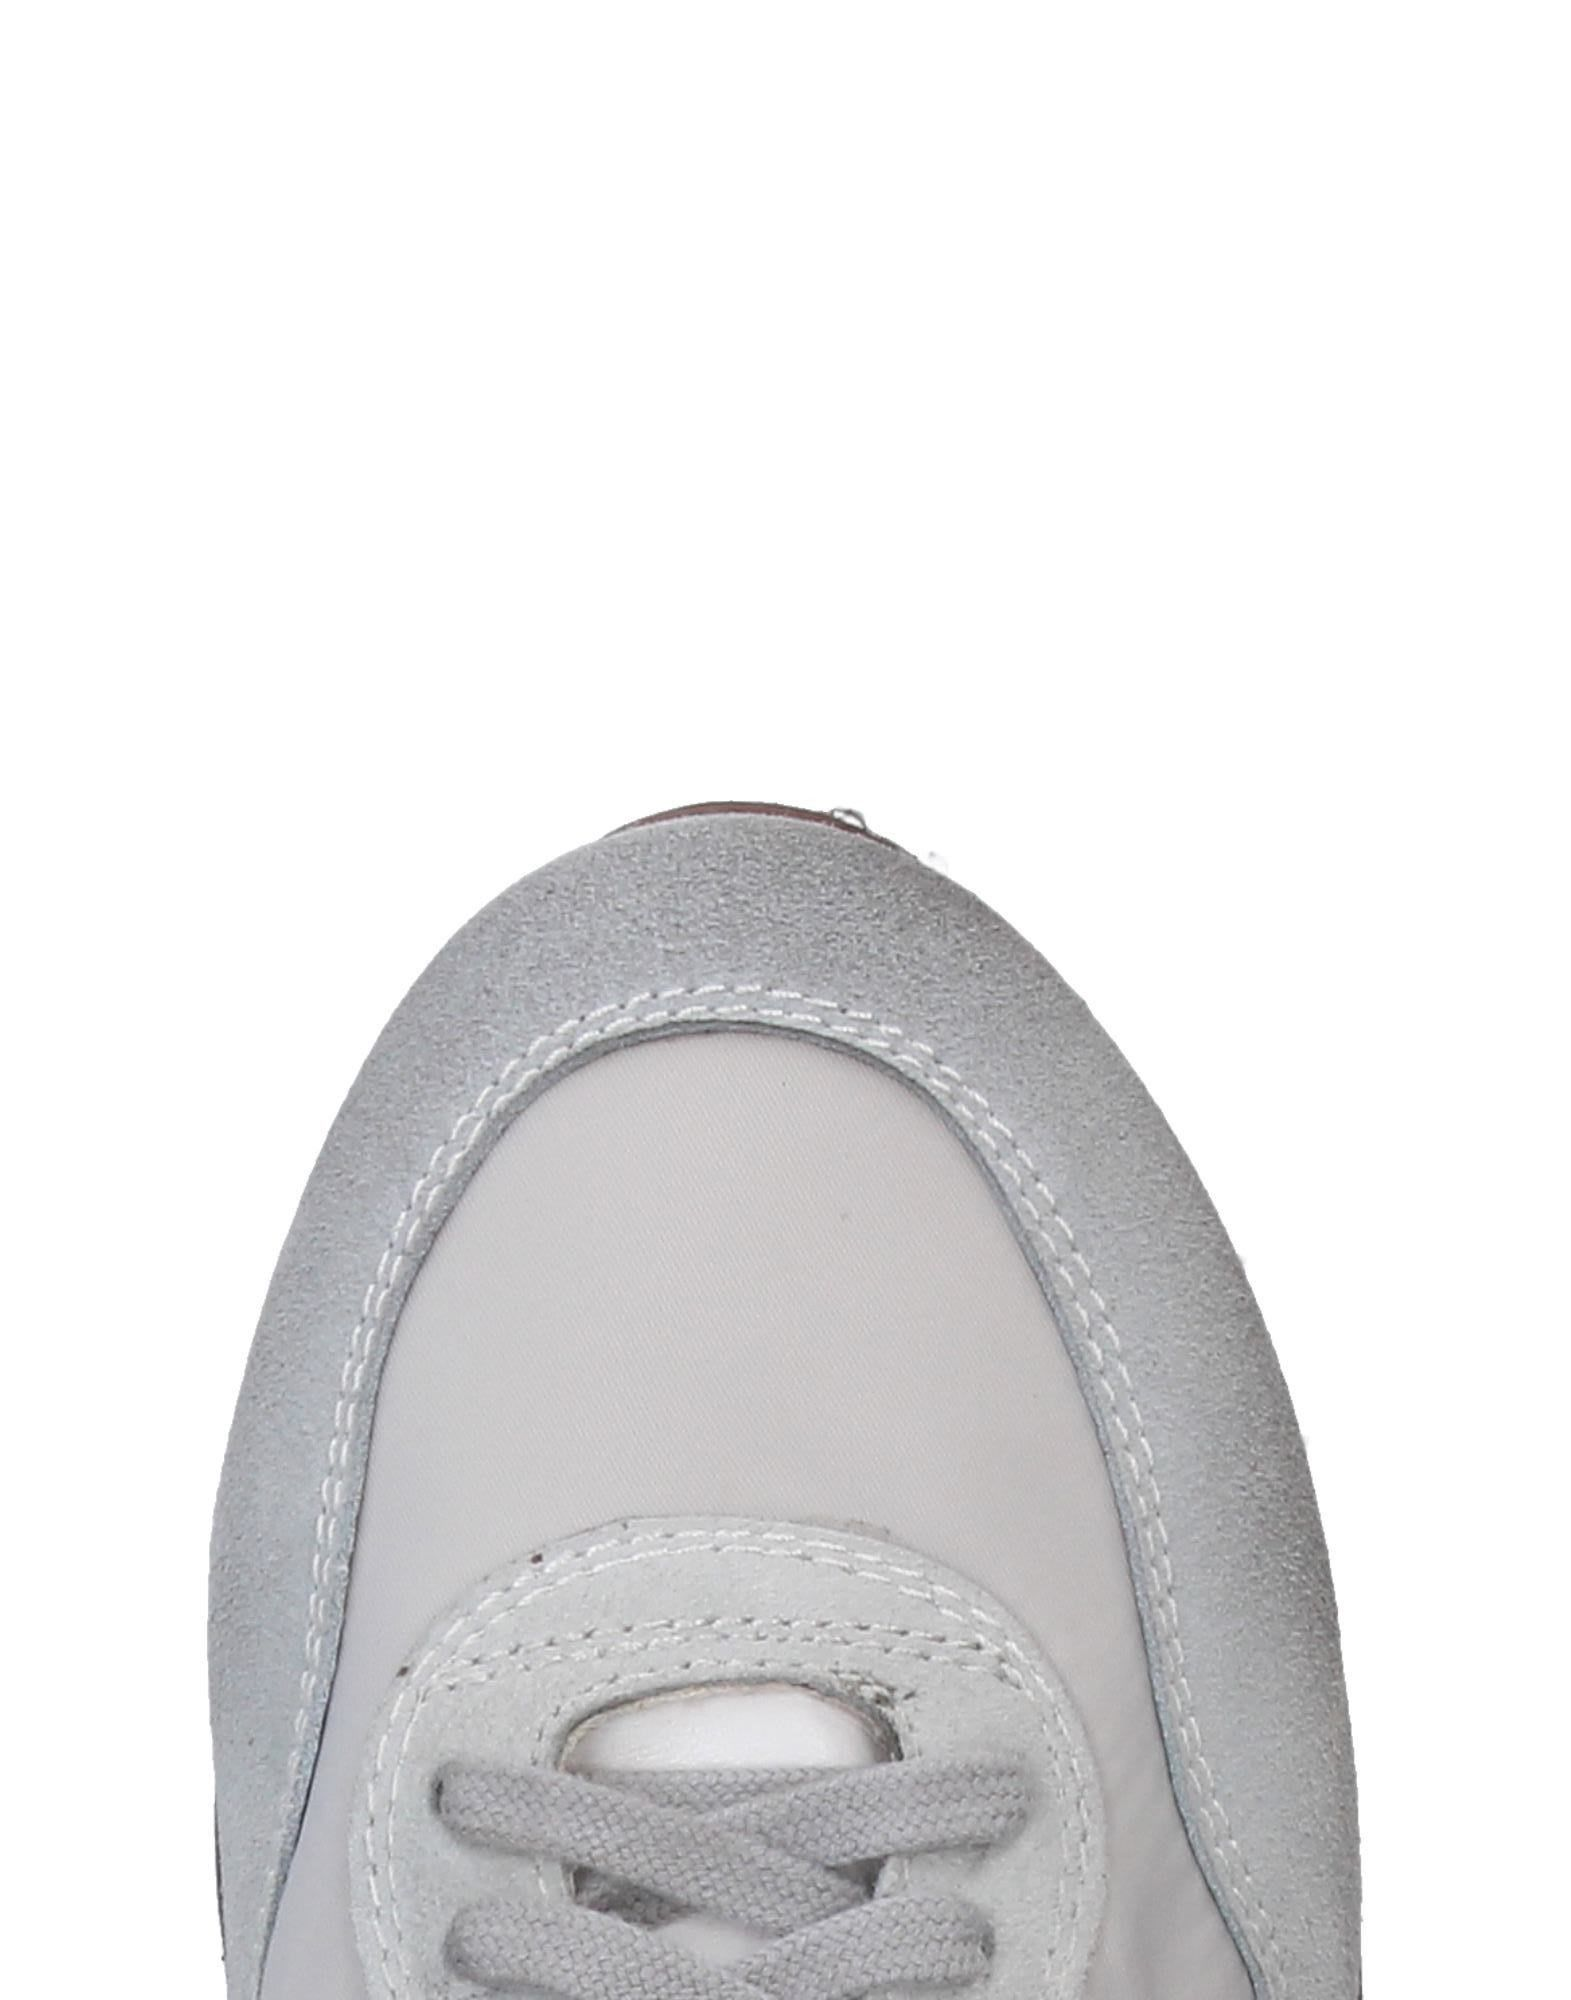 Primabase Heiße Sneakers Herren  11385639AT Heiße Primabase Schuhe f08b3e